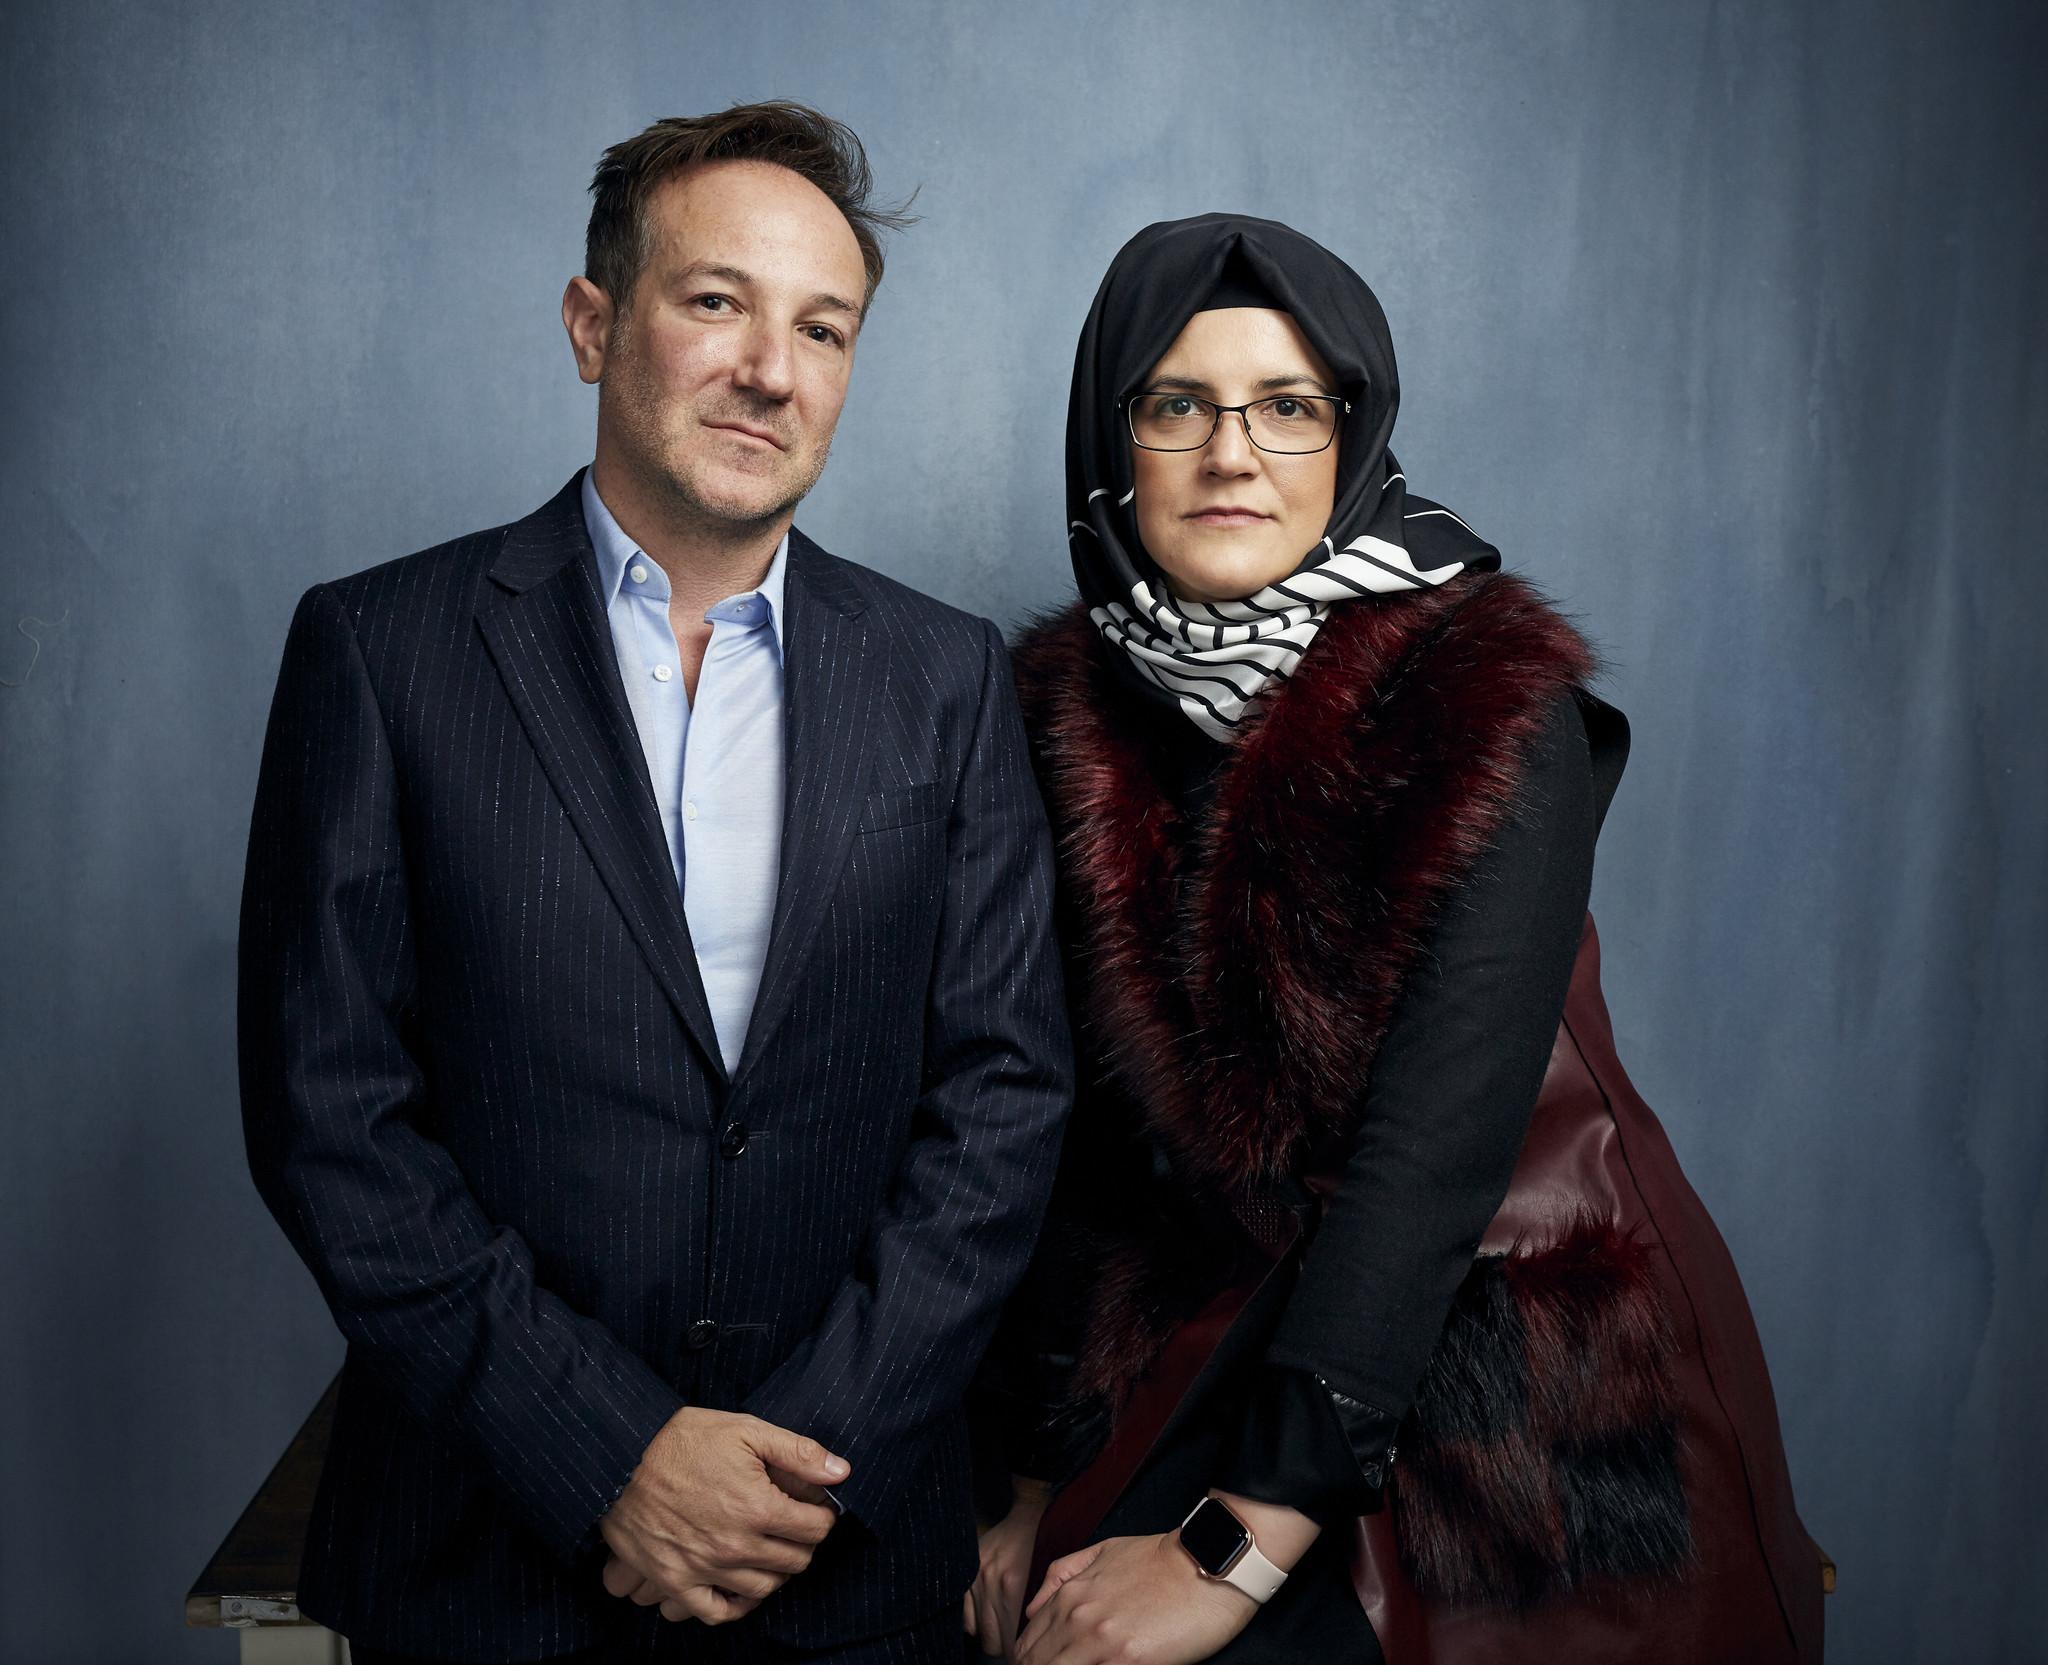 Khashoggi documentary earns standing ovation at Sundance Film Festival